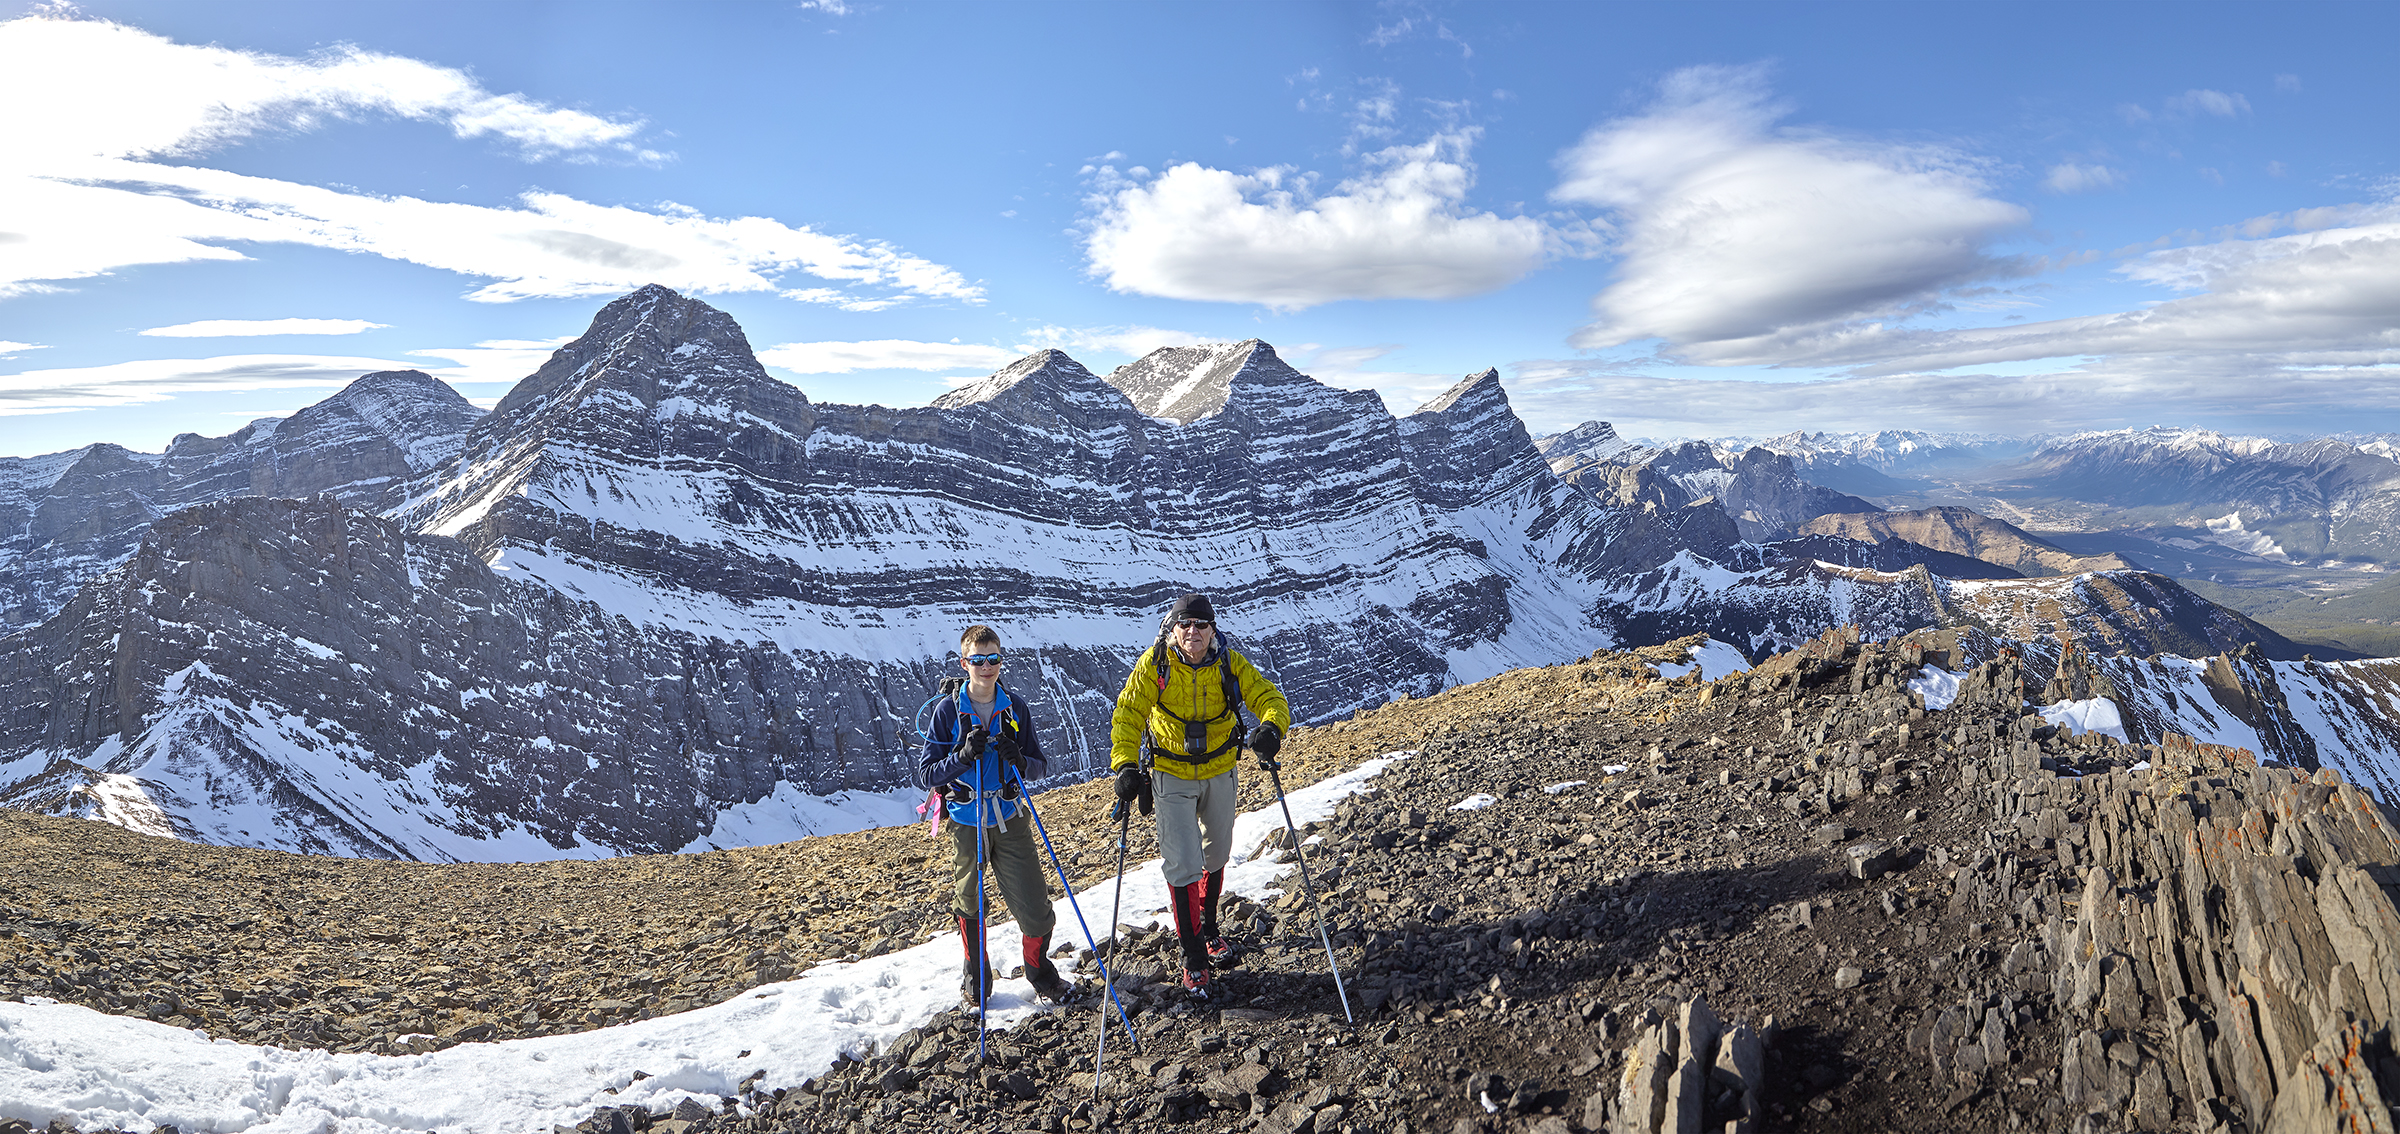 Yuri and Milan on the summit of Mount Allan. Mount Lougheed looms behind.